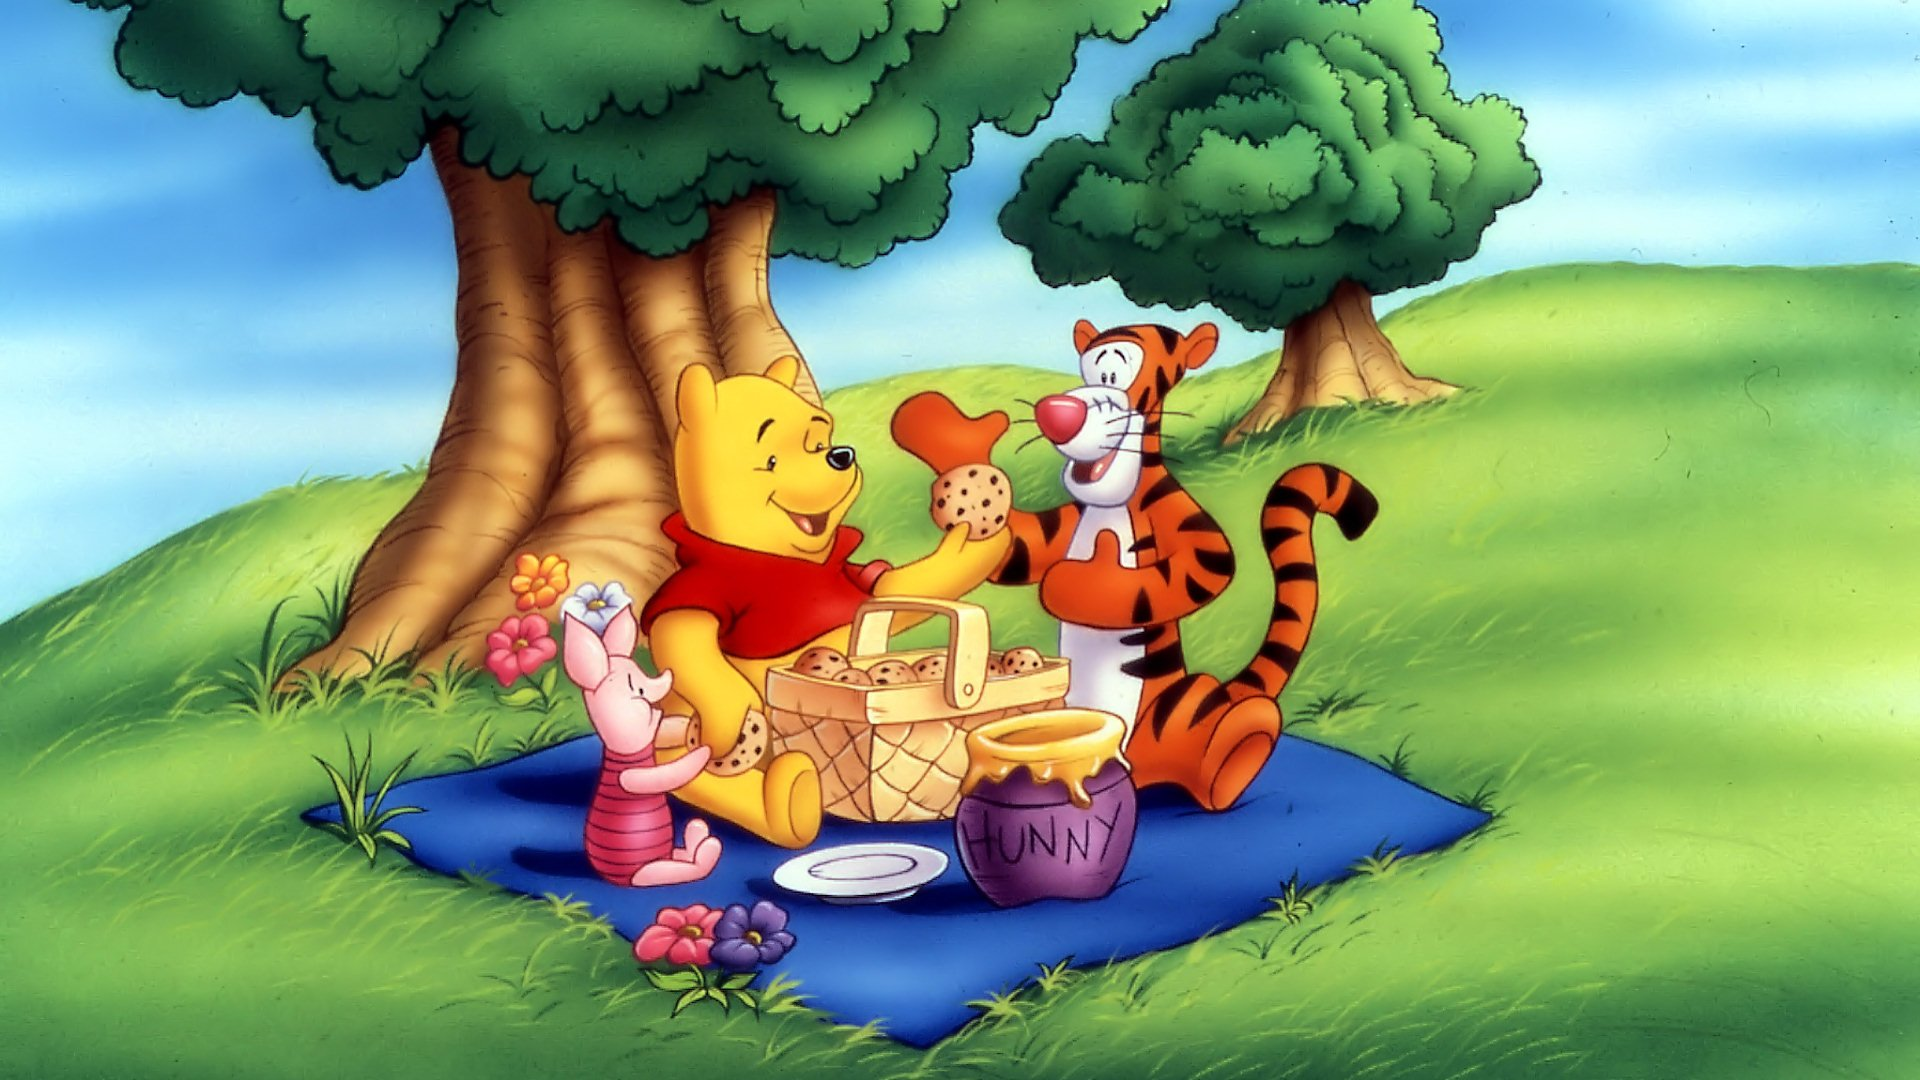 Winnie the pooh wallpaper 19936 1920x1080 px hdwallsource winnie the pooh wallpaper 19936 voltagebd Image collections